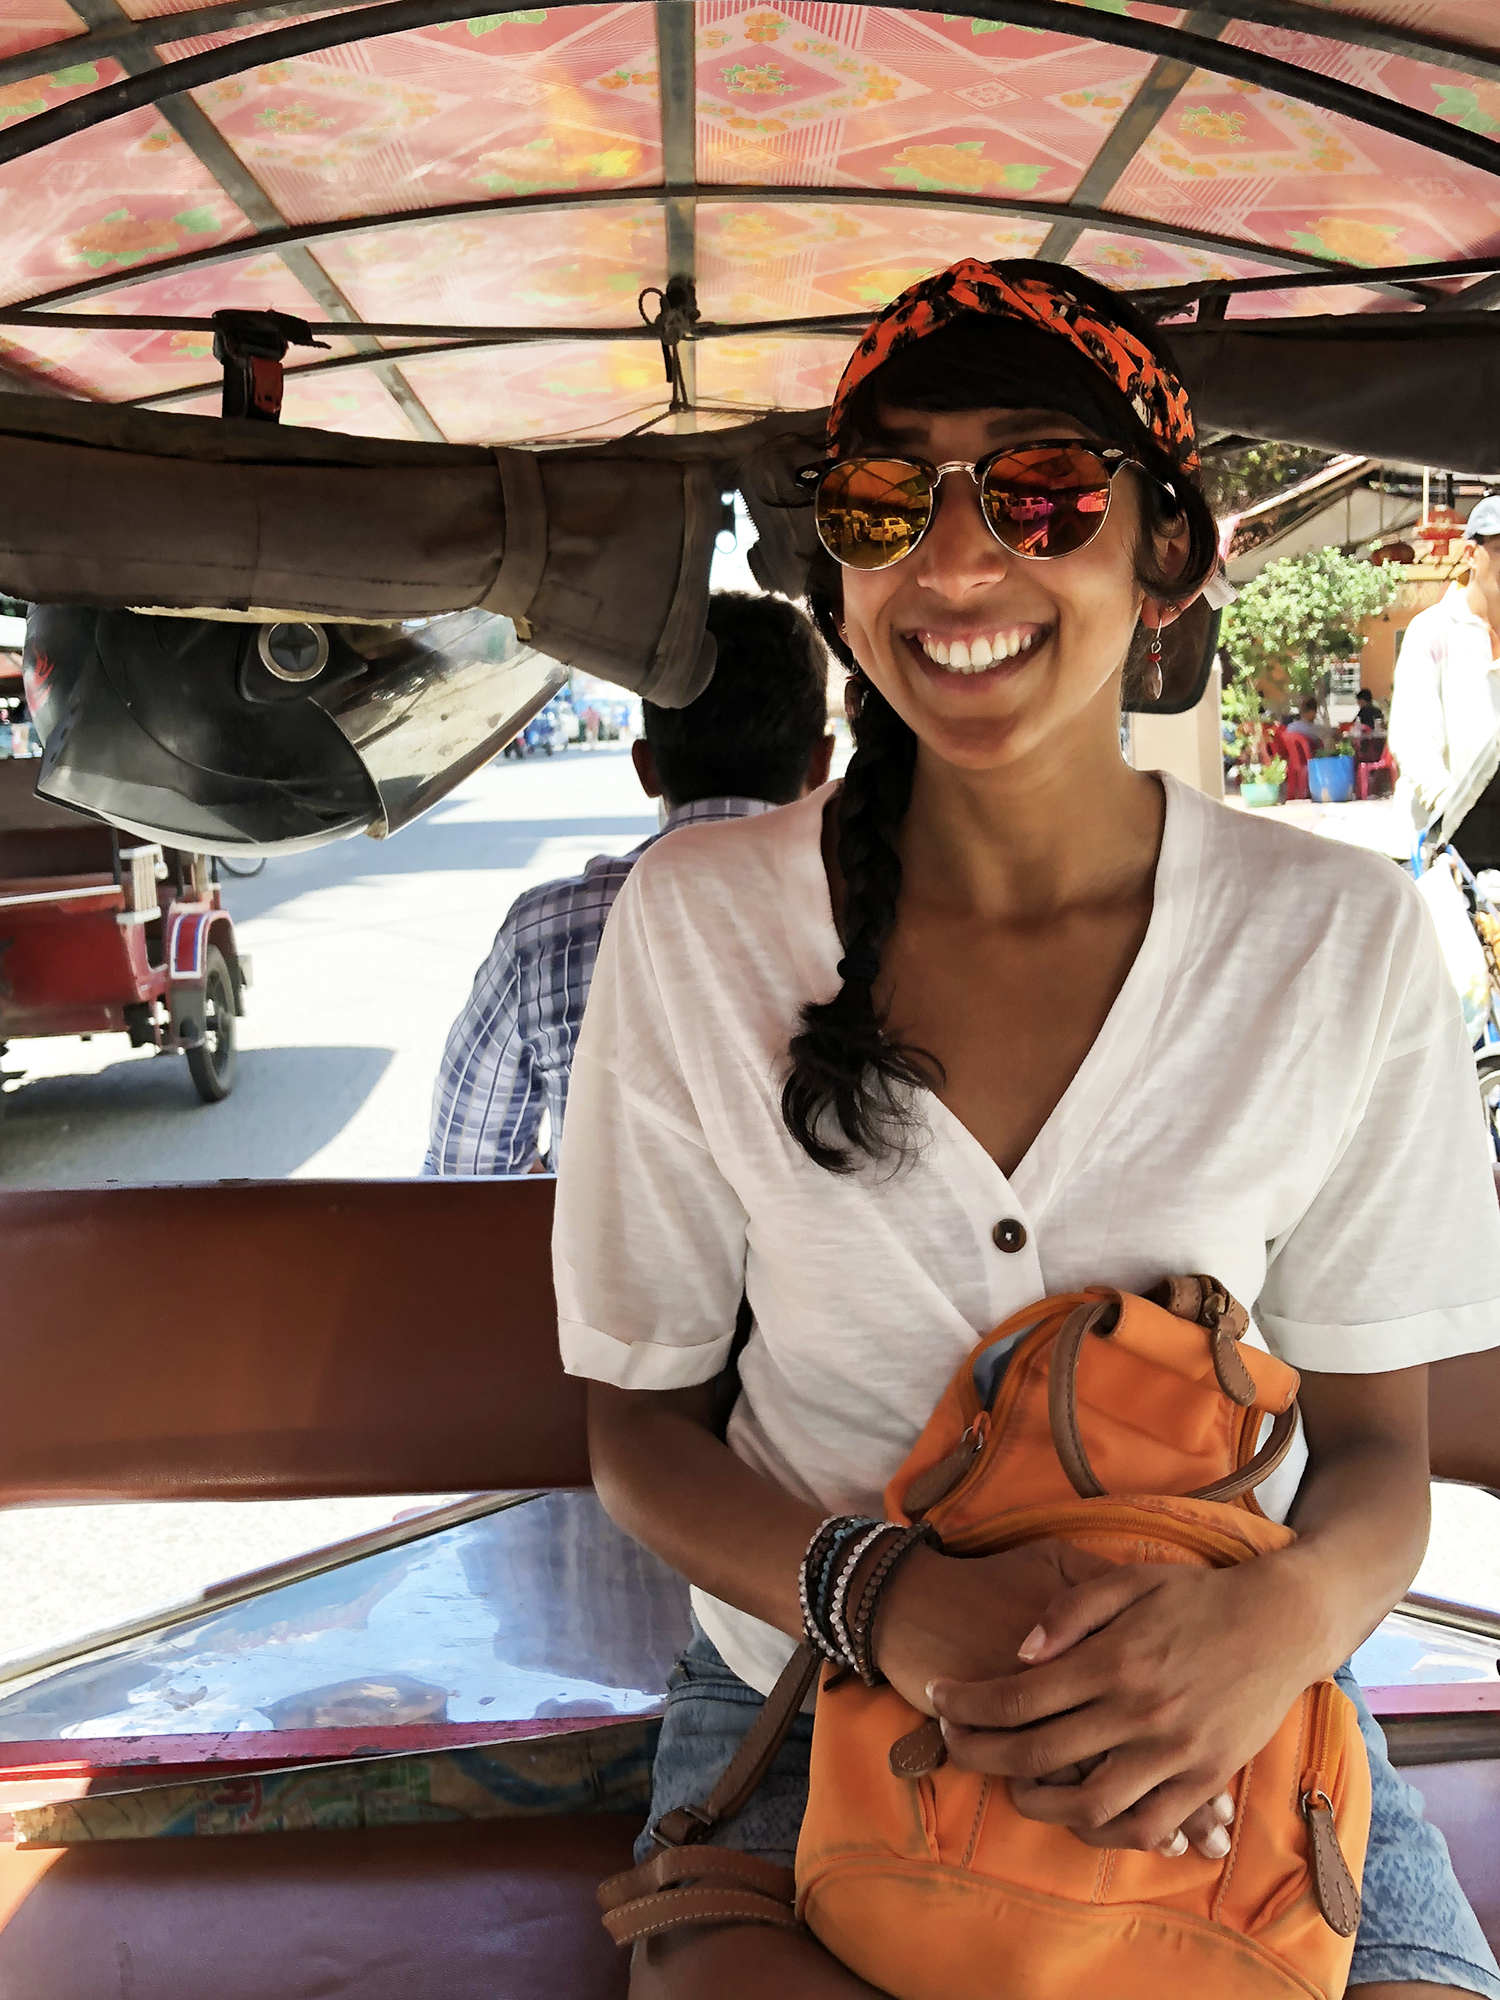 cambodia-travel-guide-tuk-tuk